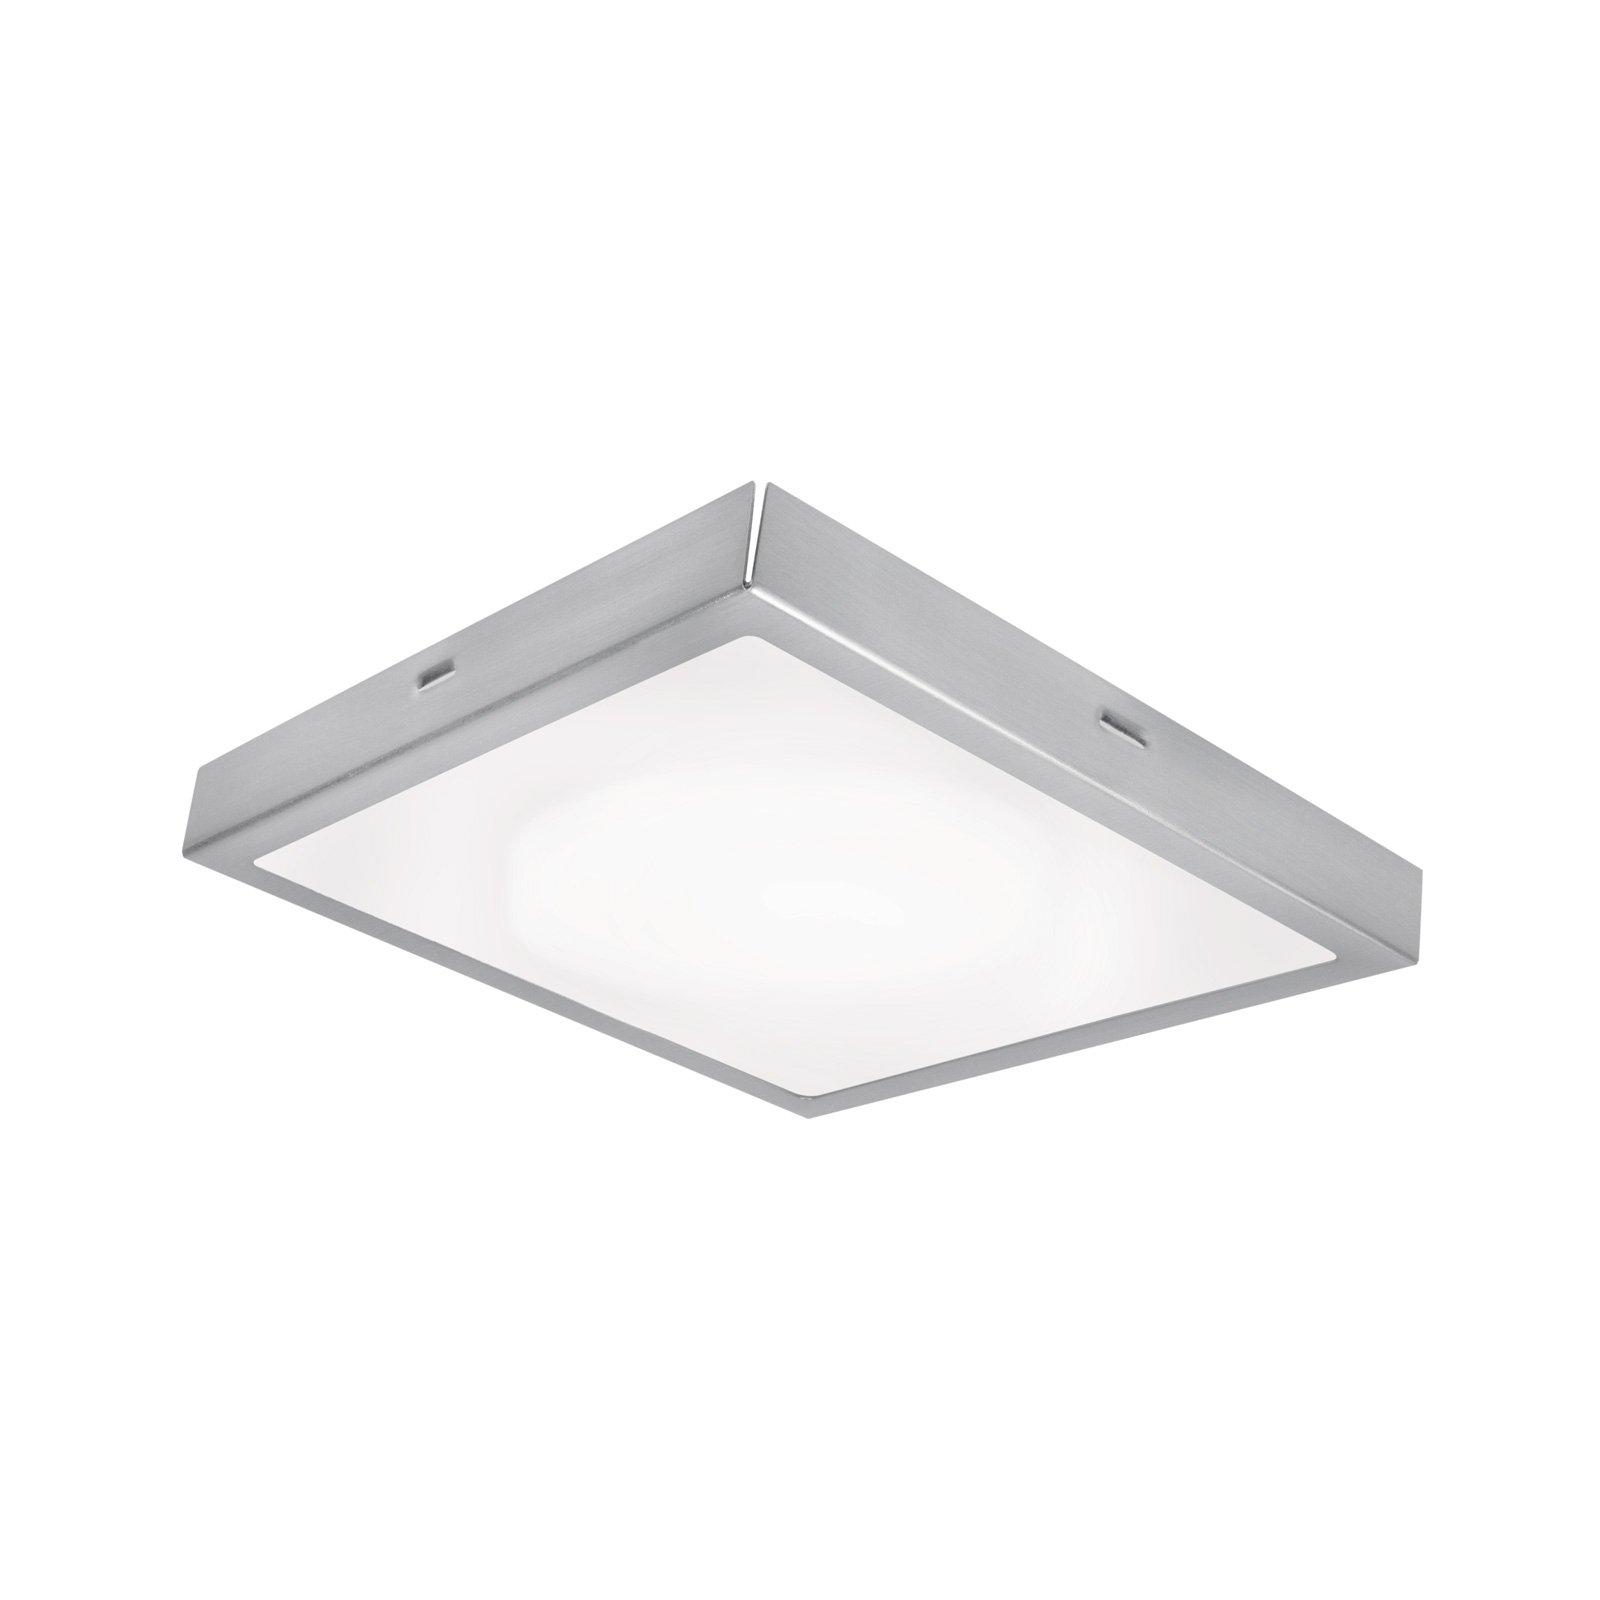 LEDVANCE Lunive Vela LED-taklampe 22cm 4 000 K